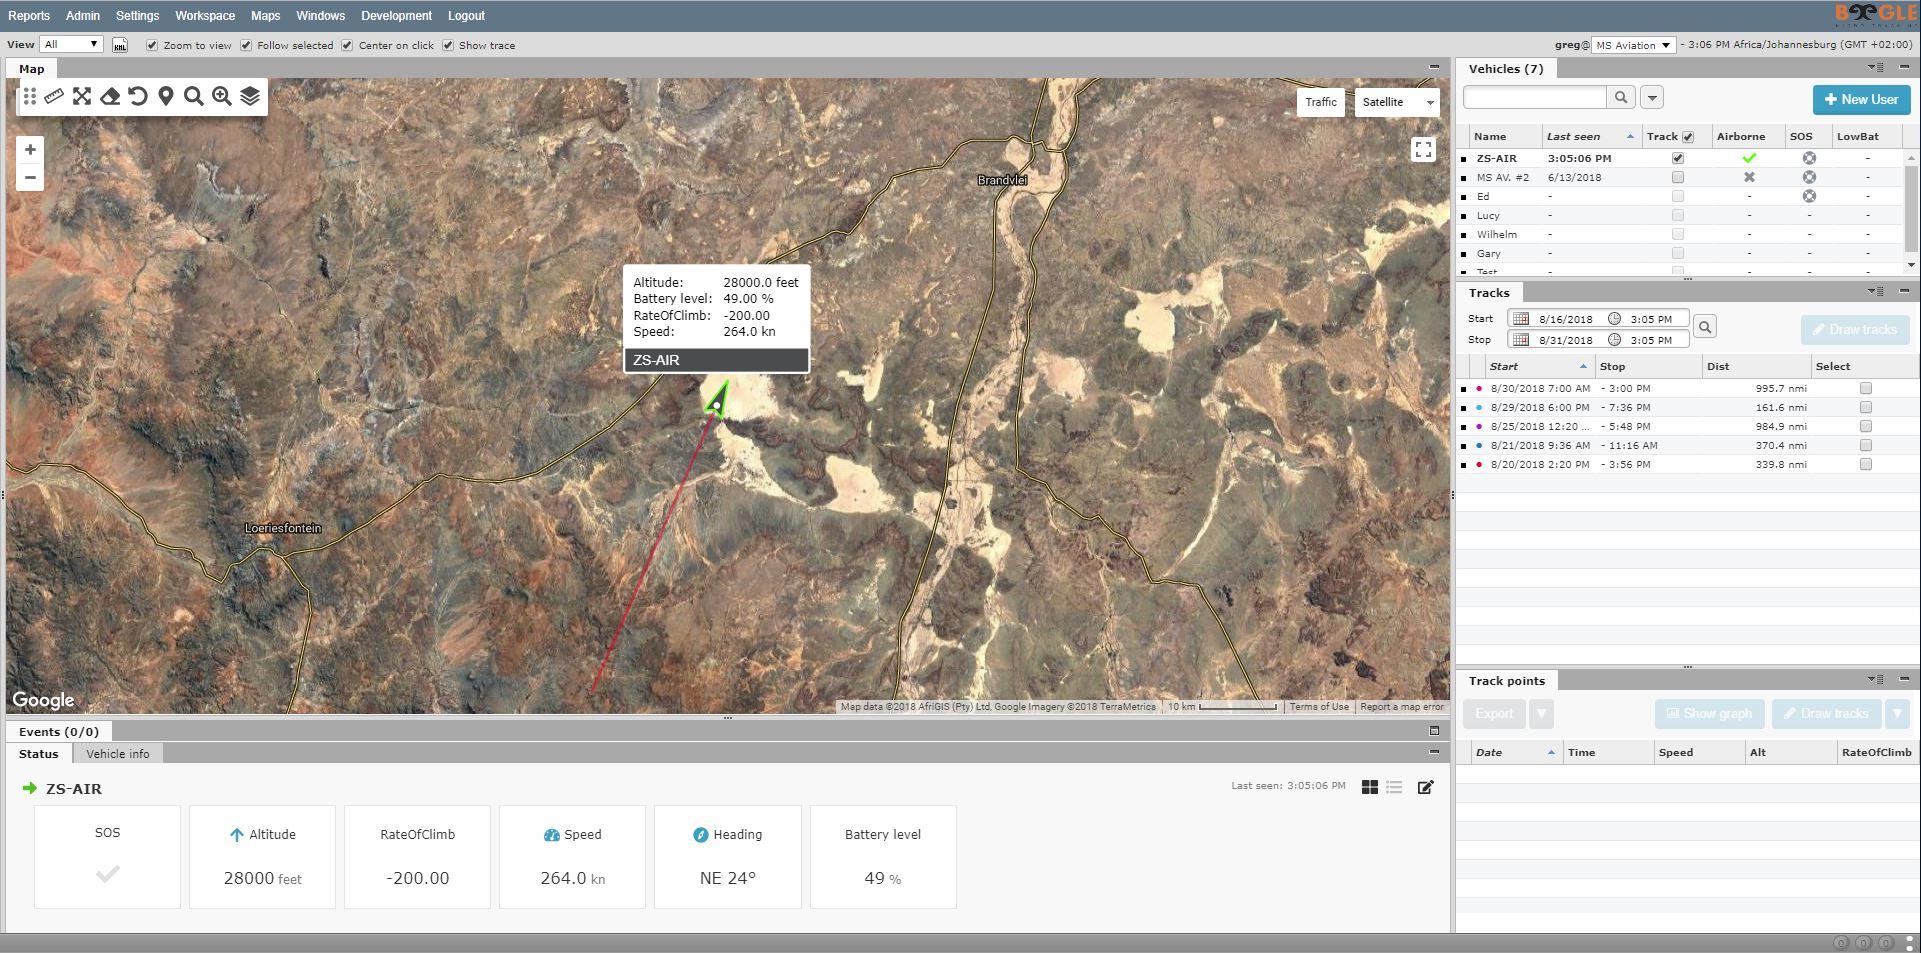 Beegle X-1 web portal overview